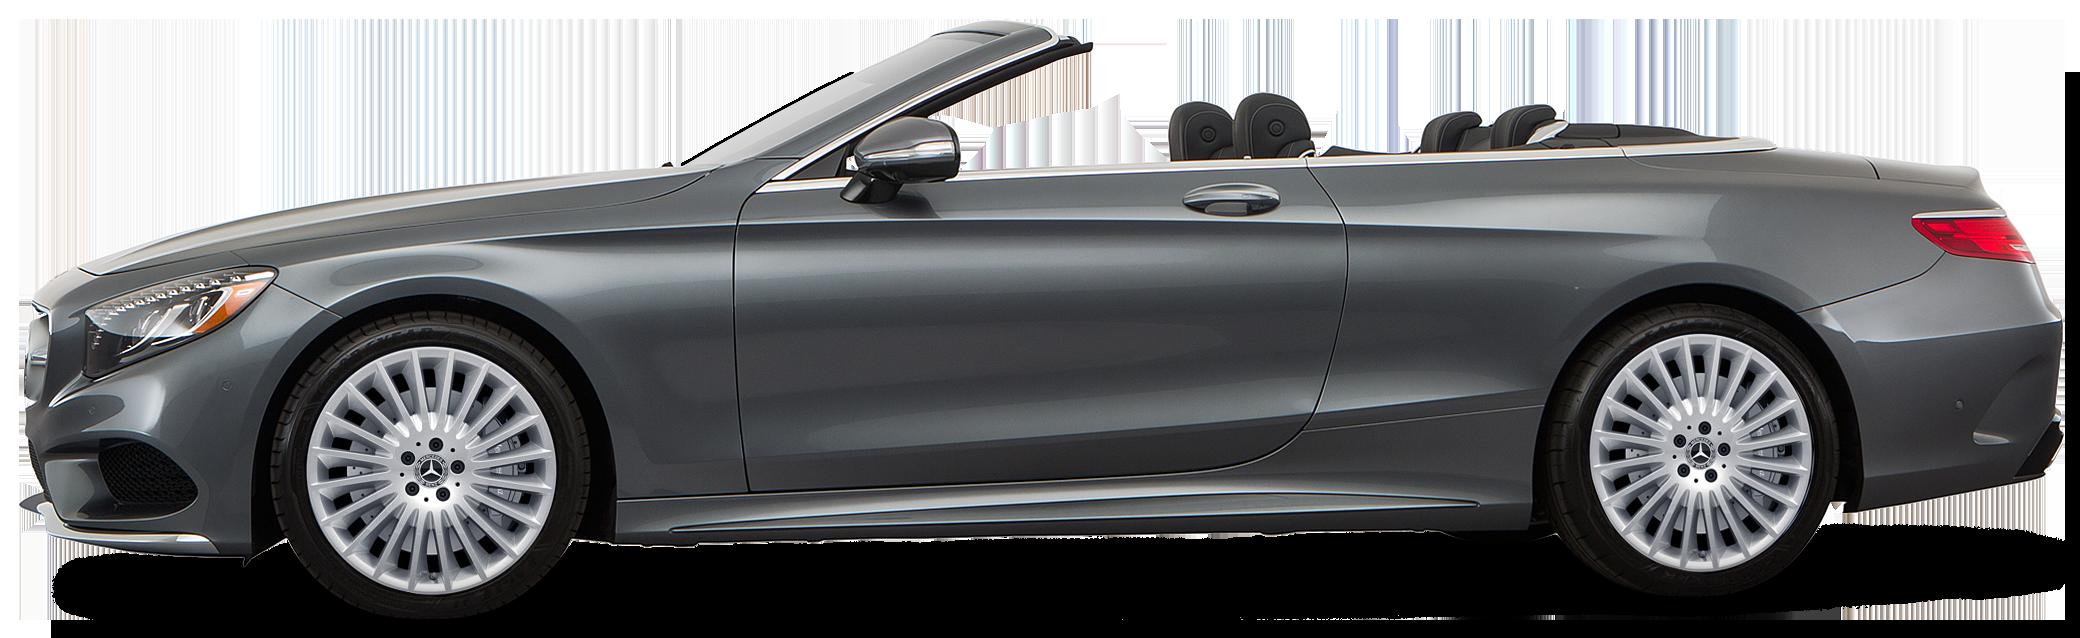 2018 Mercedes-Benz S-Class Cabriolet